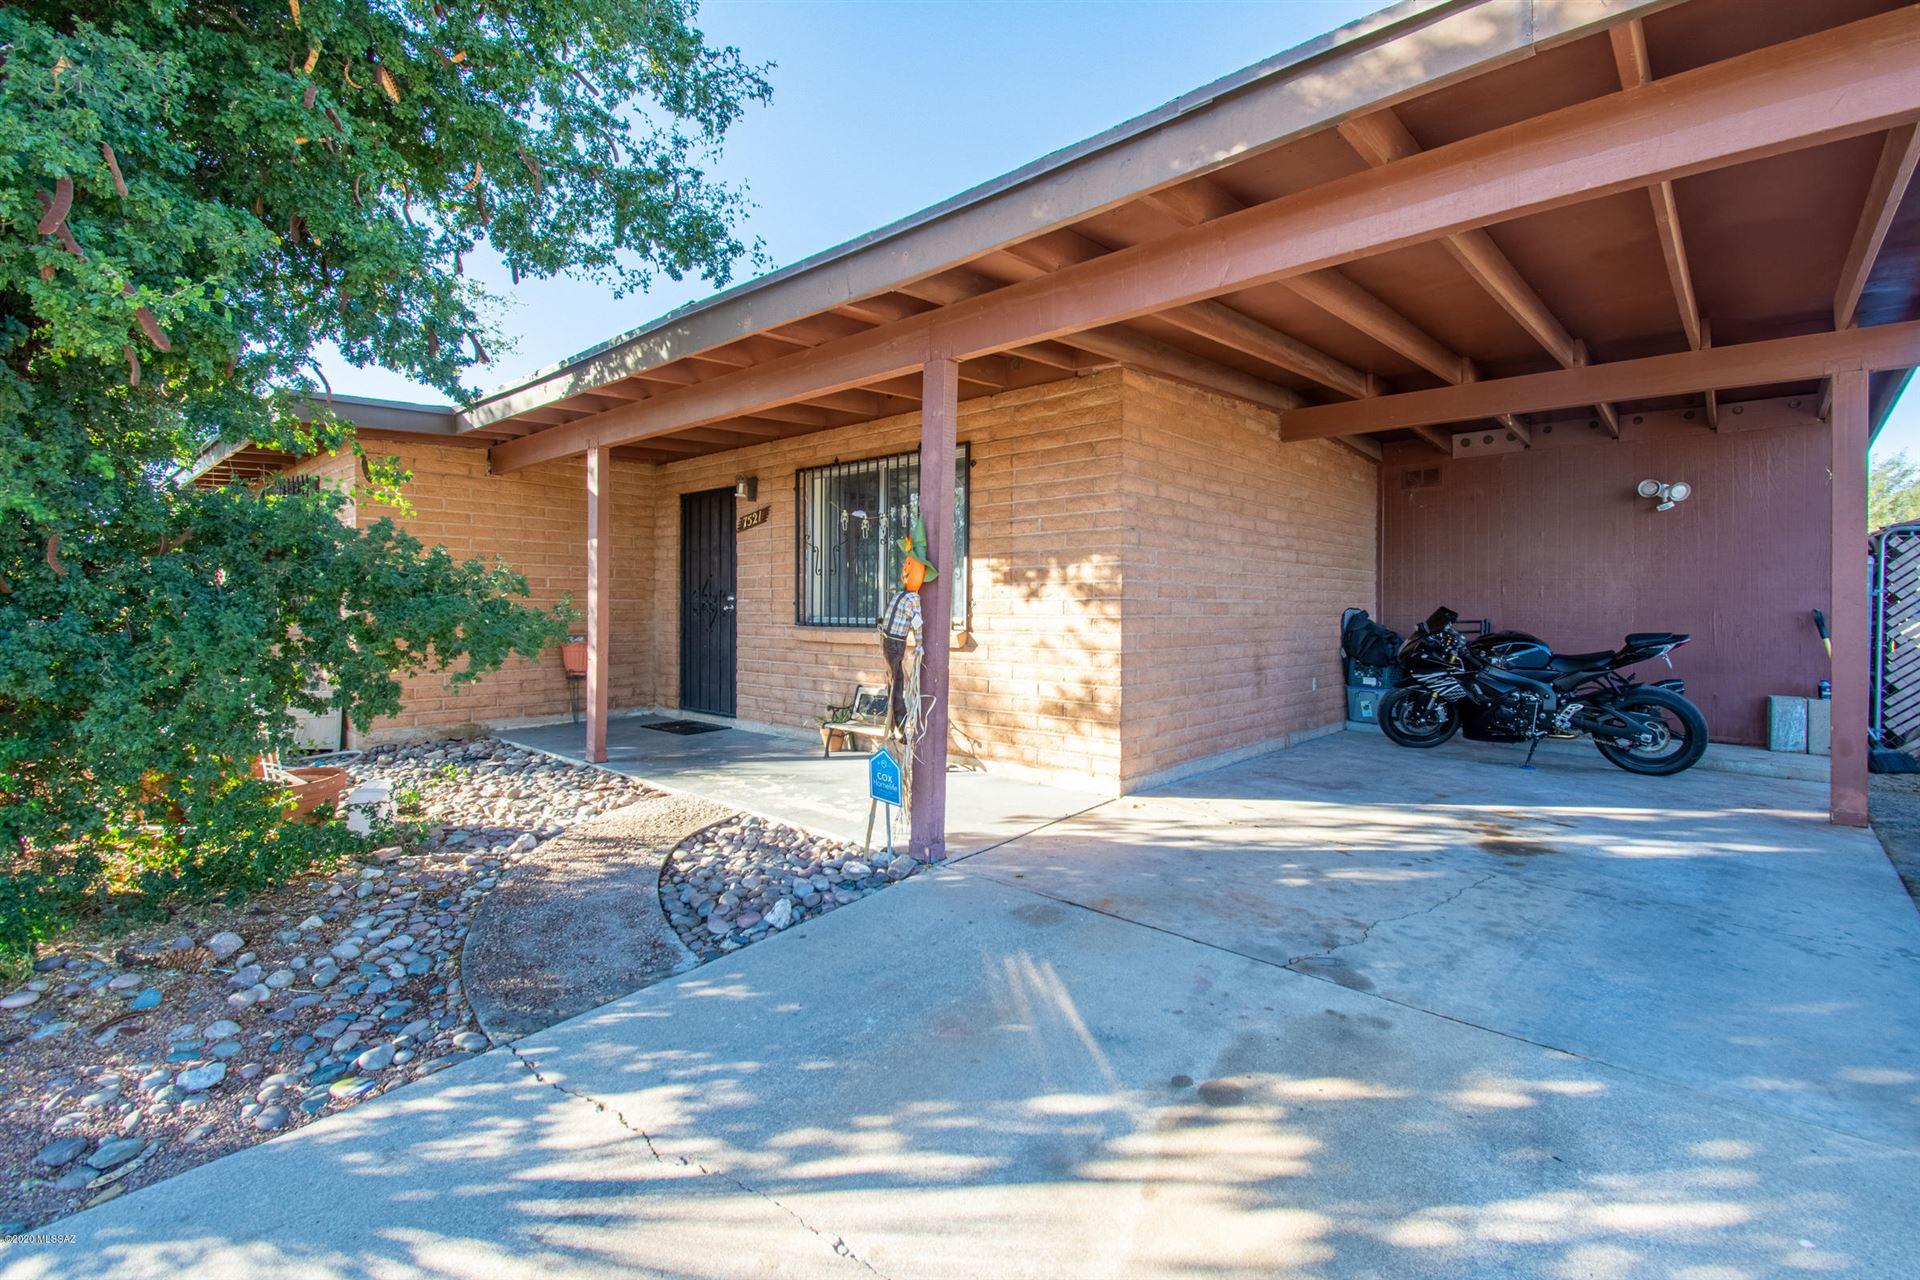 7521 E Lakeside Drive, Tucson, AZ 85730 - MLS#: 22029636